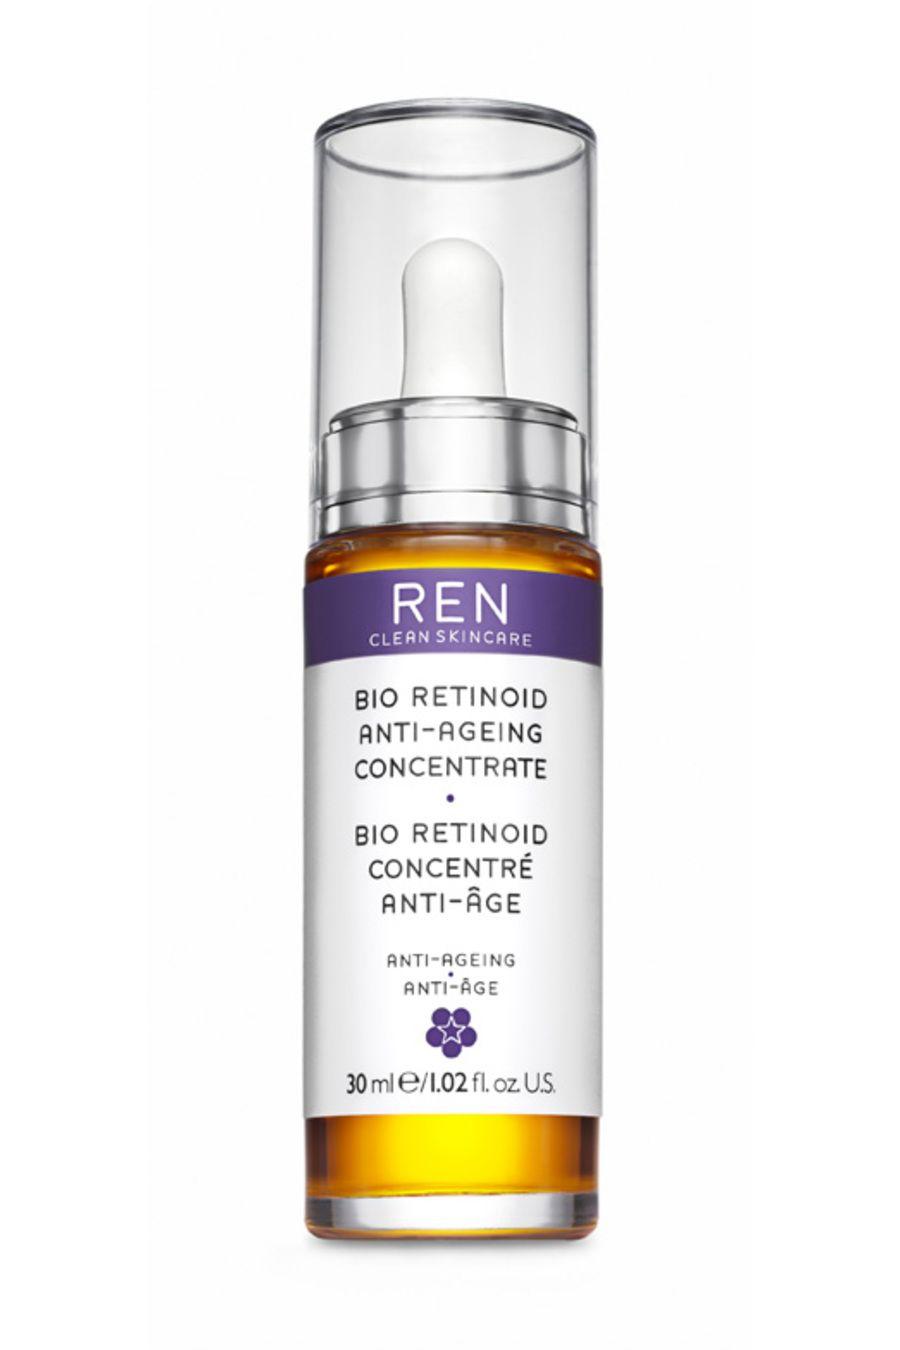 Blissim : REN - Concentré anti-âge ultra-concentré Bio Retinoid - Concentré anti-âge ultra-concentré Bio Retinoid